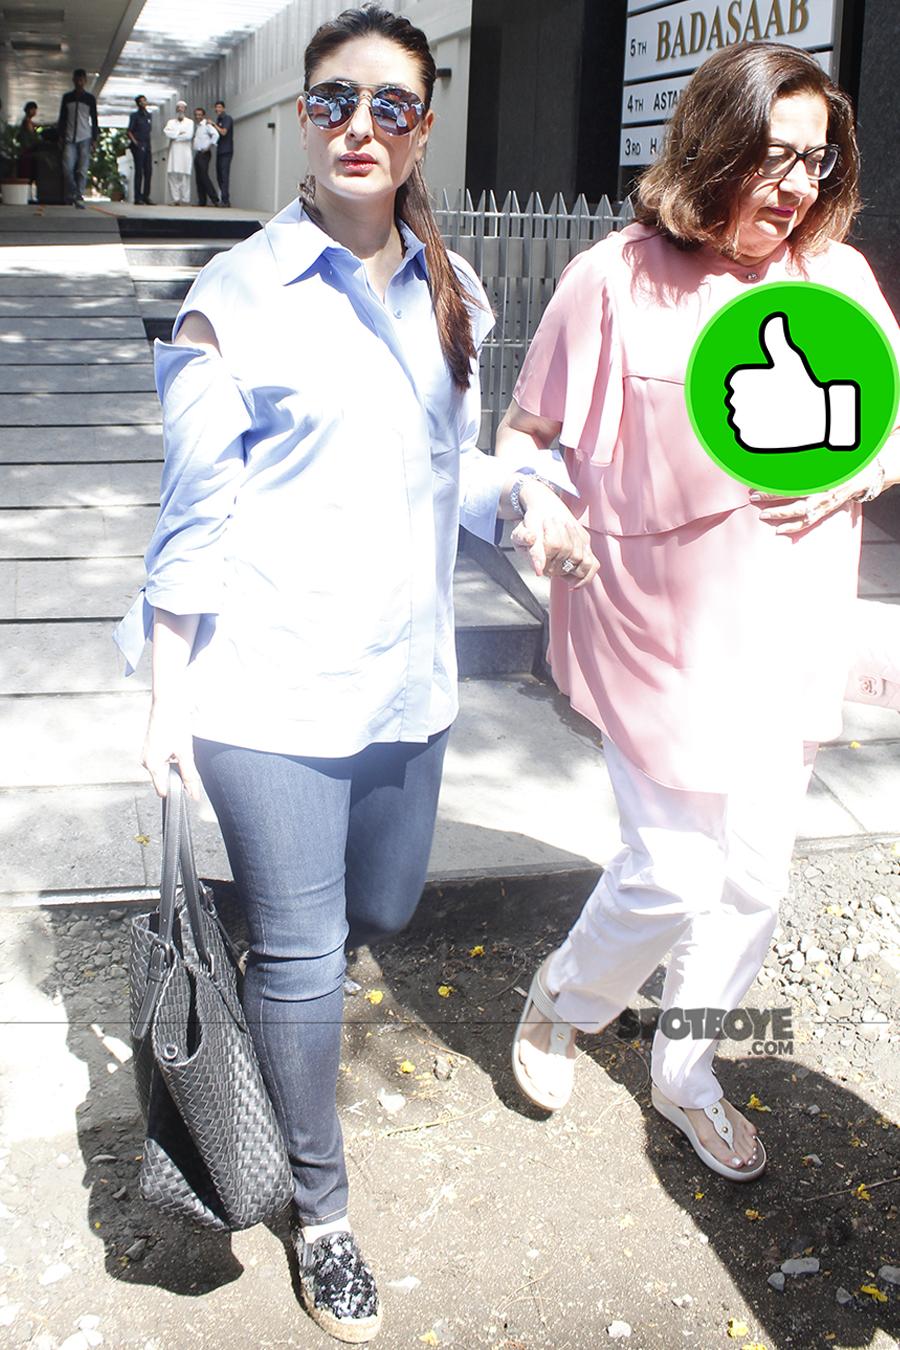 kareena kapoors casual look is awesome